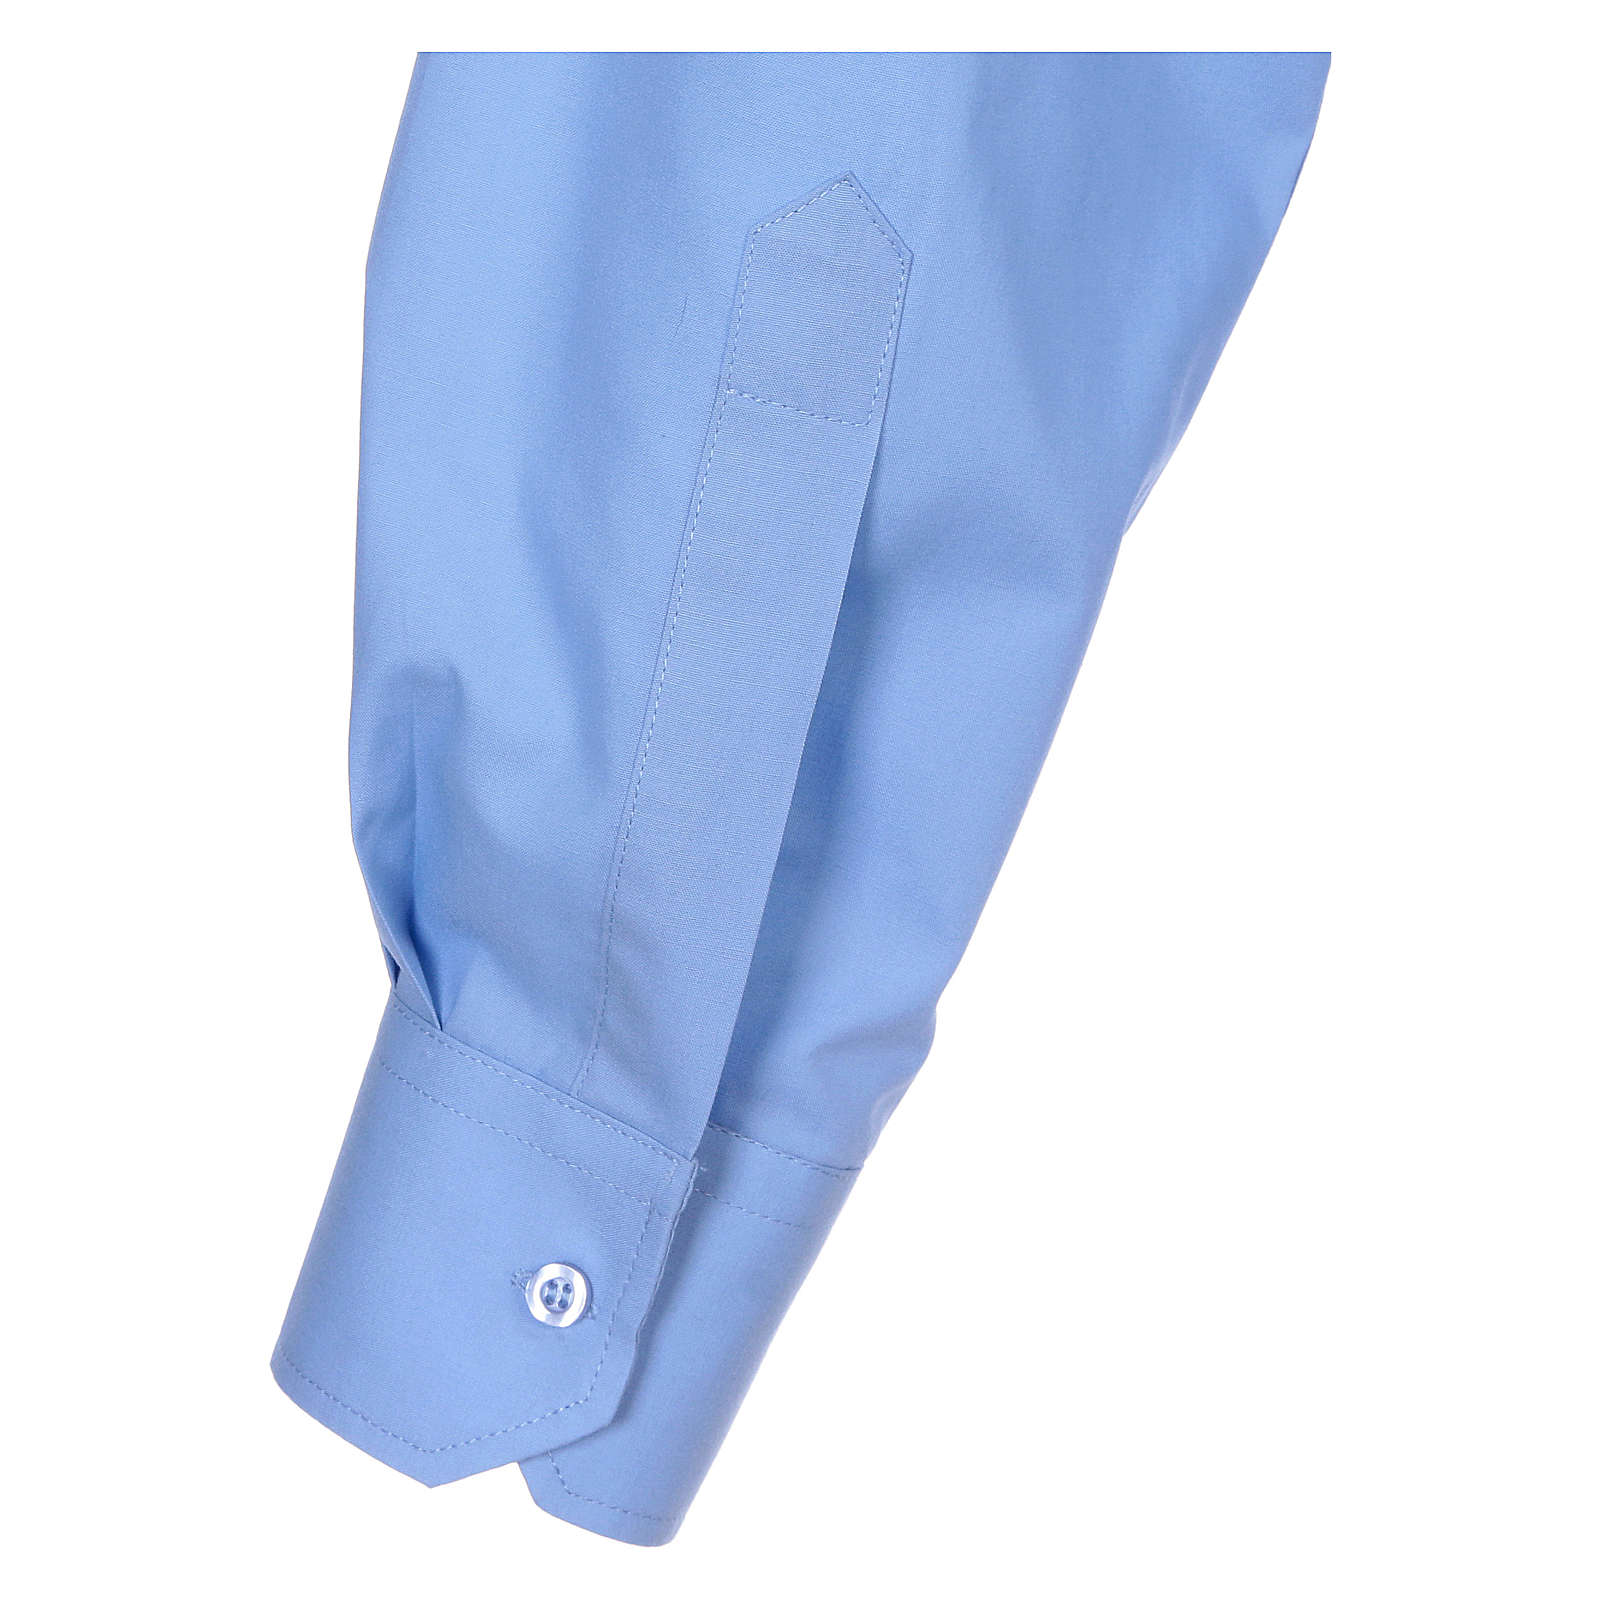 Chemise Clergy longues manches tissu mixte coton bleu clair In Primis 4